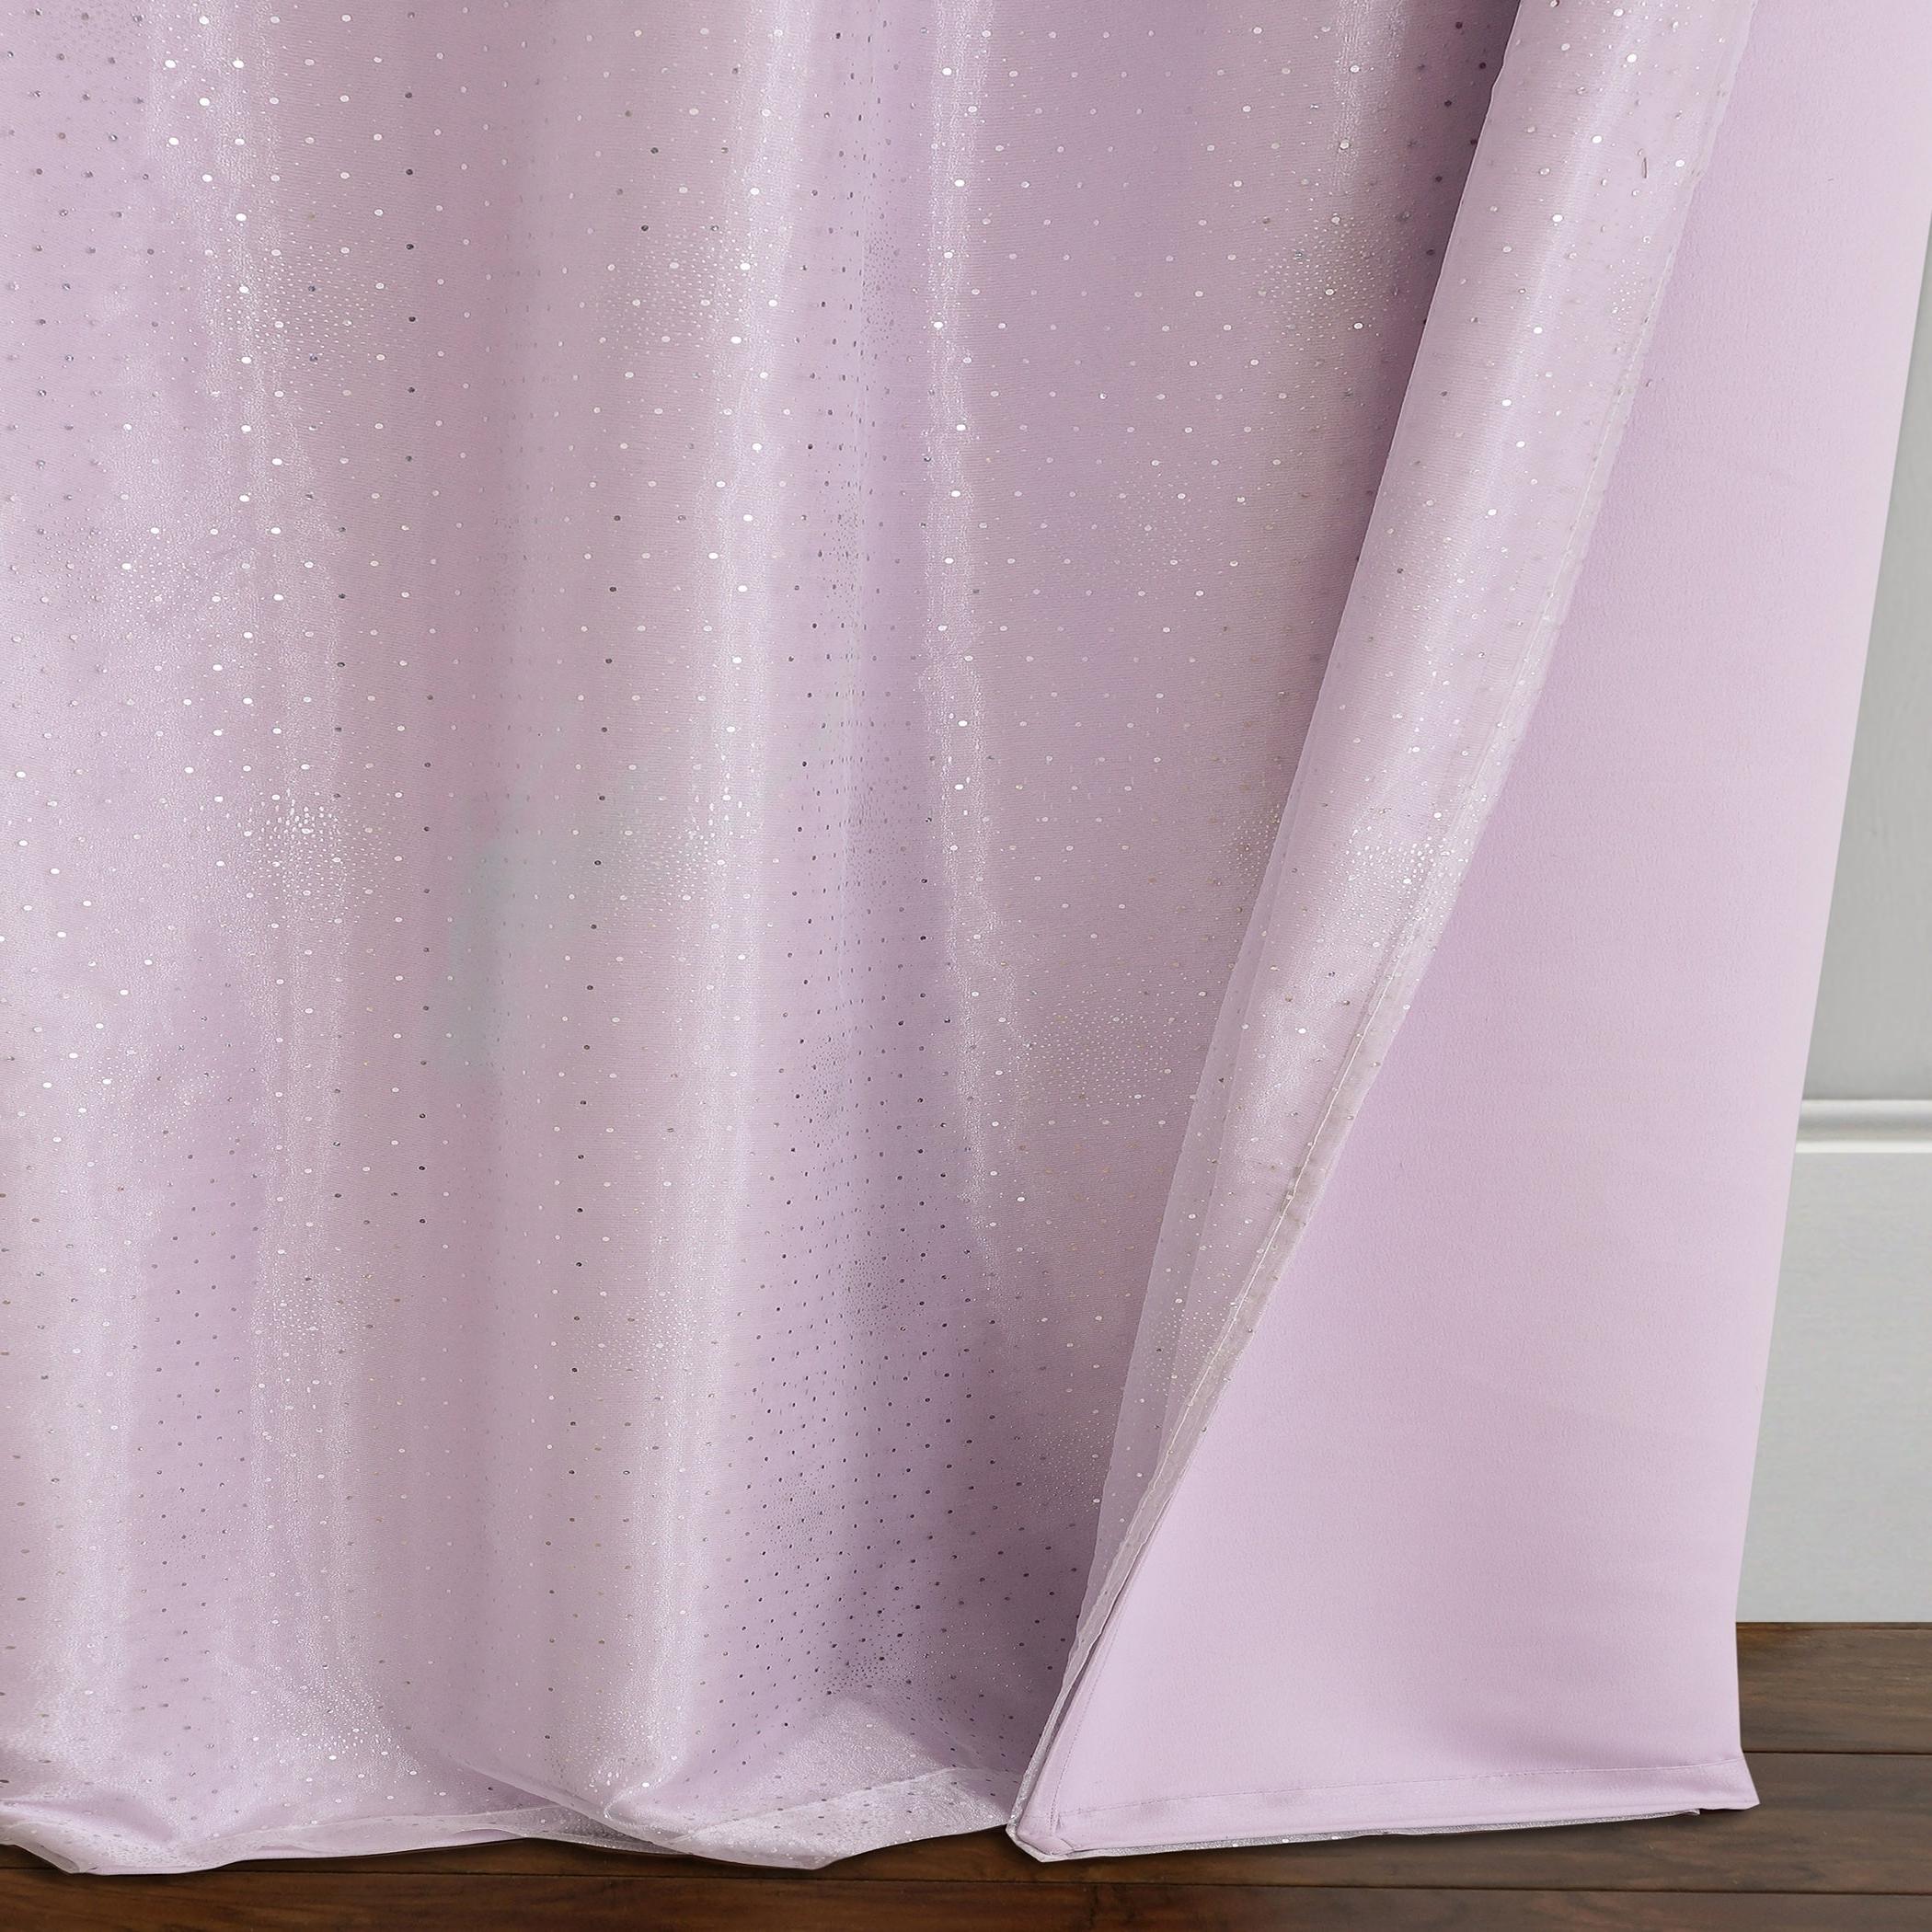 Most Recently Released Elrene Aurora Kids Room Darkening Layered Sheer Curtain Within Elrene Aurora Kids Room Darkening Layered Sheer Curtains (View 2 of 20)